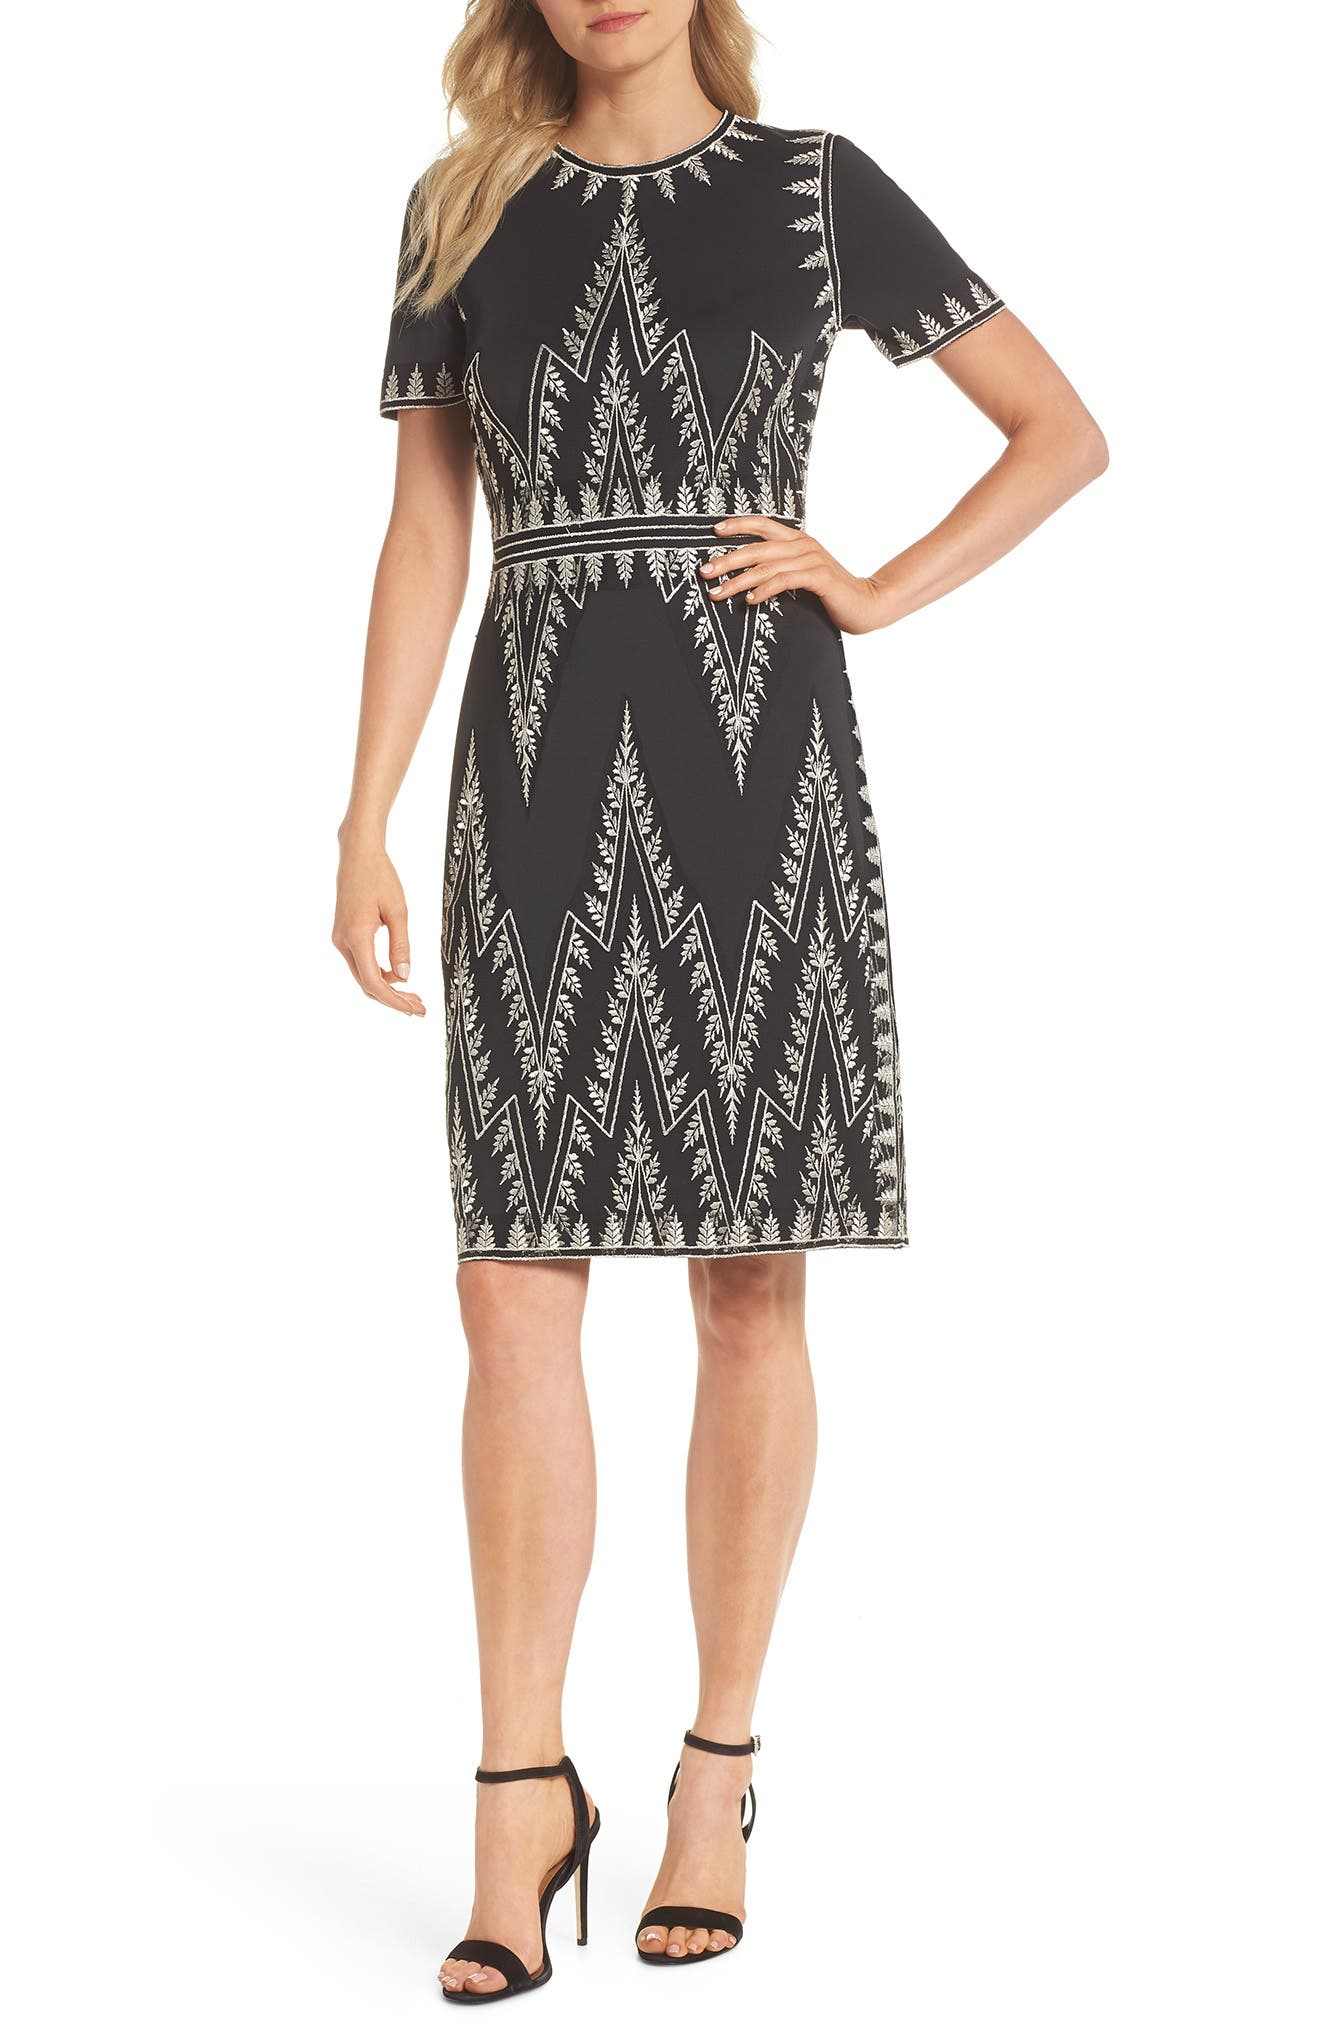 Embroidered Chevron Dress,                             Main thumbnail 1, color,                             Black/ Silver